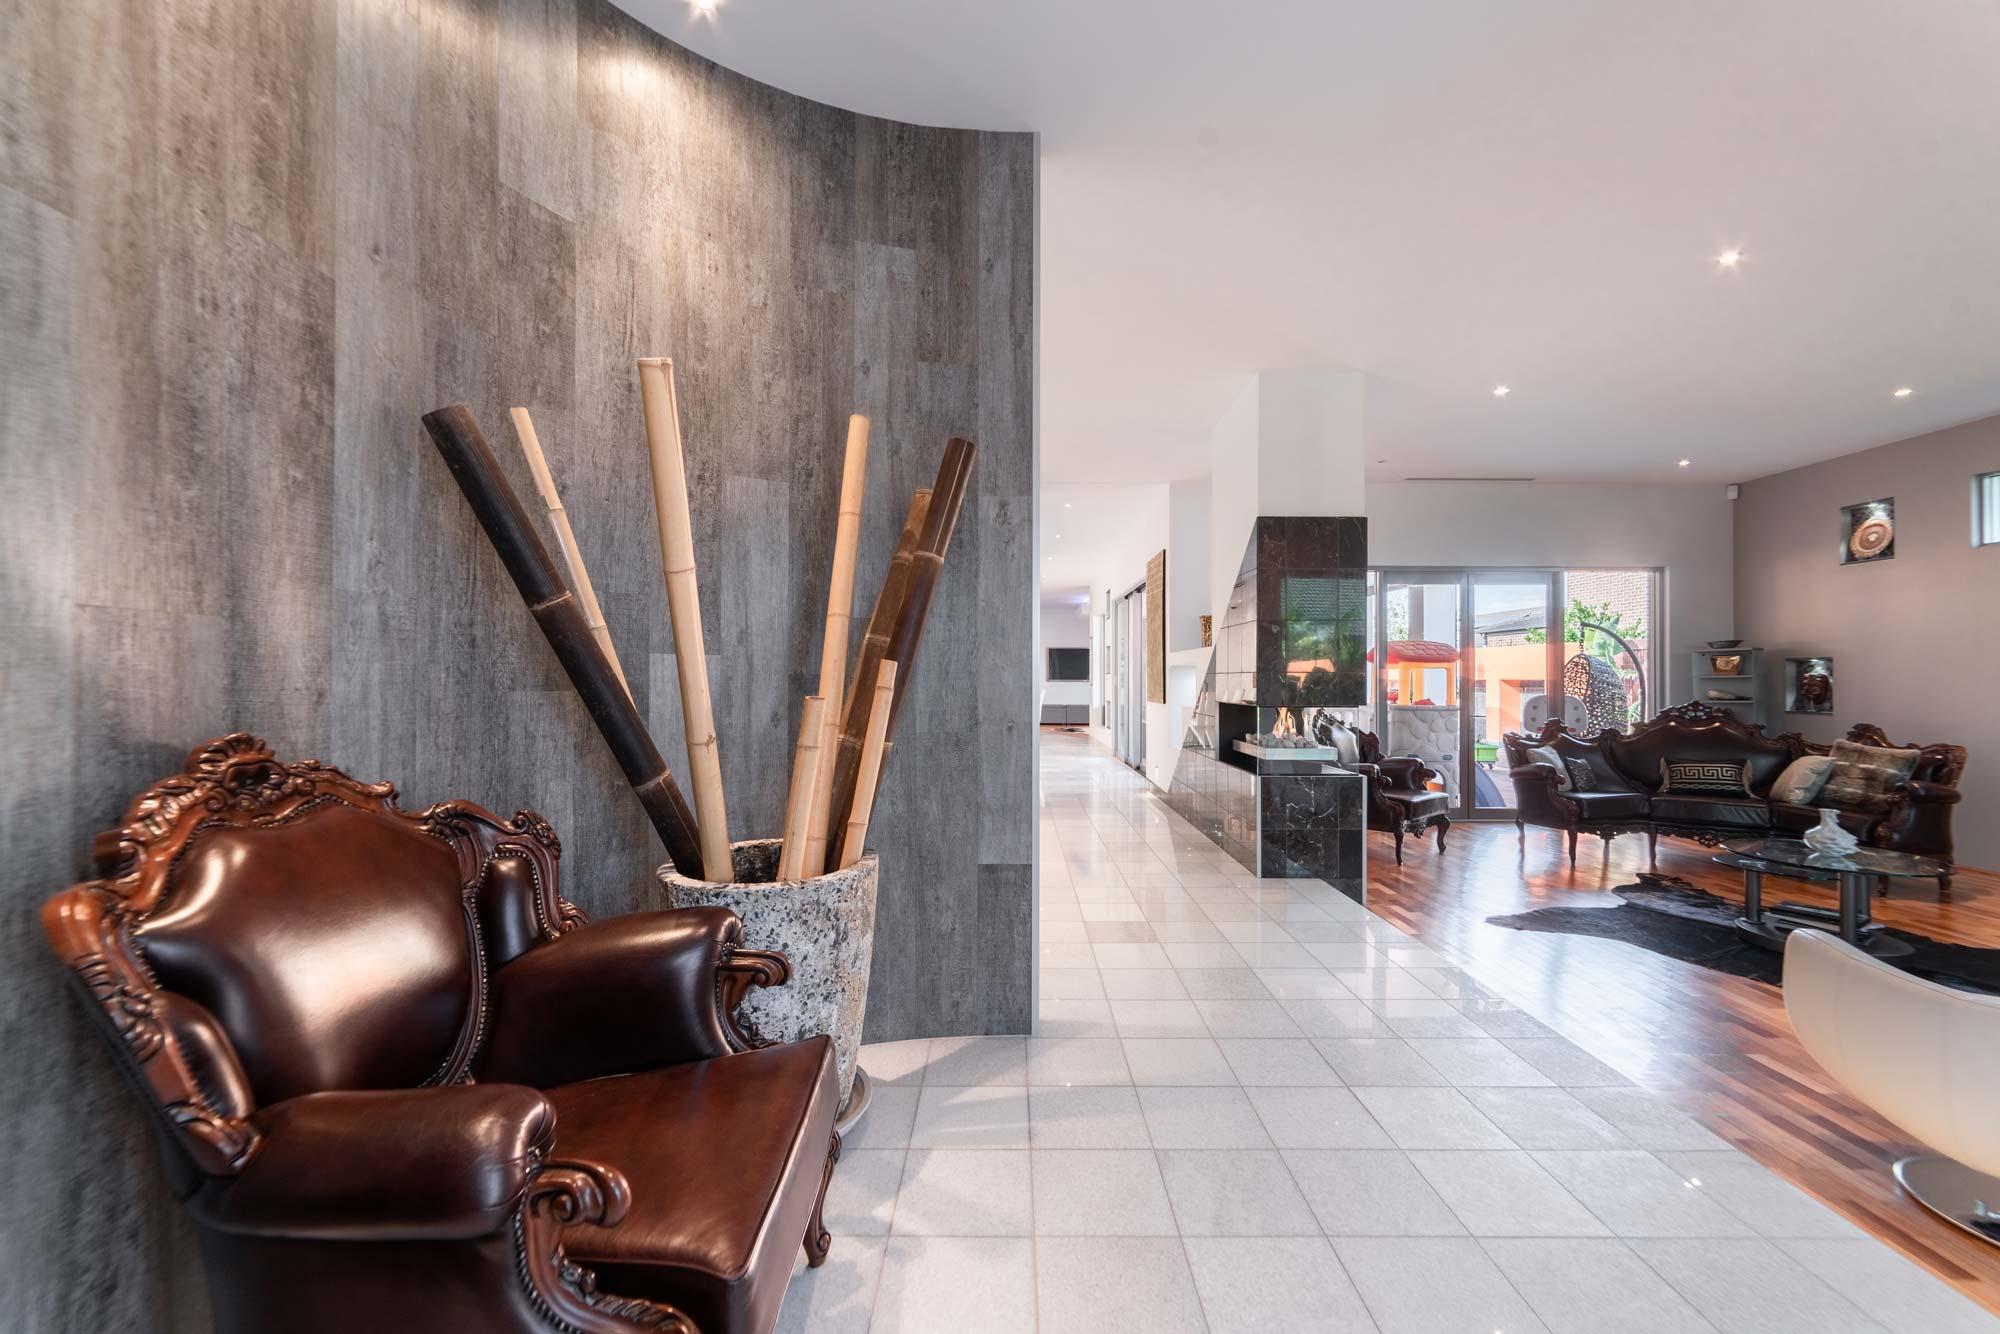 Modern, tiled interior space